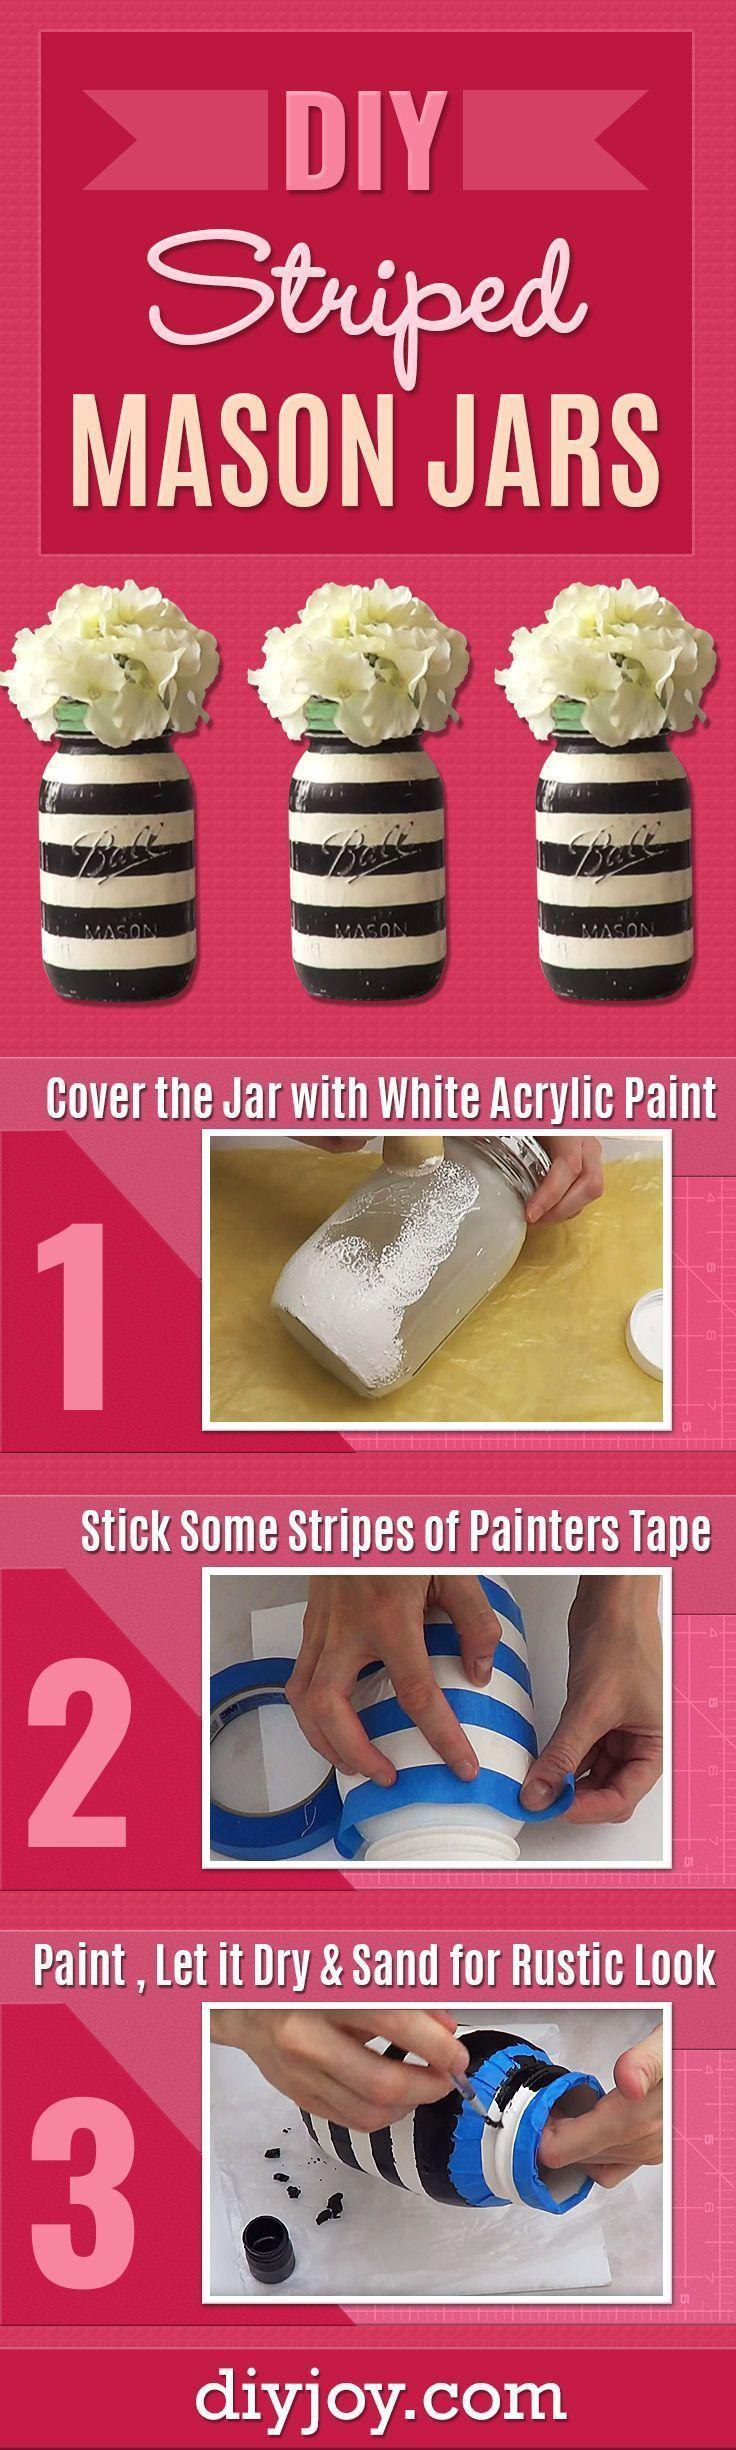 Diy painted mason jars with stripes easy striped mason jars make